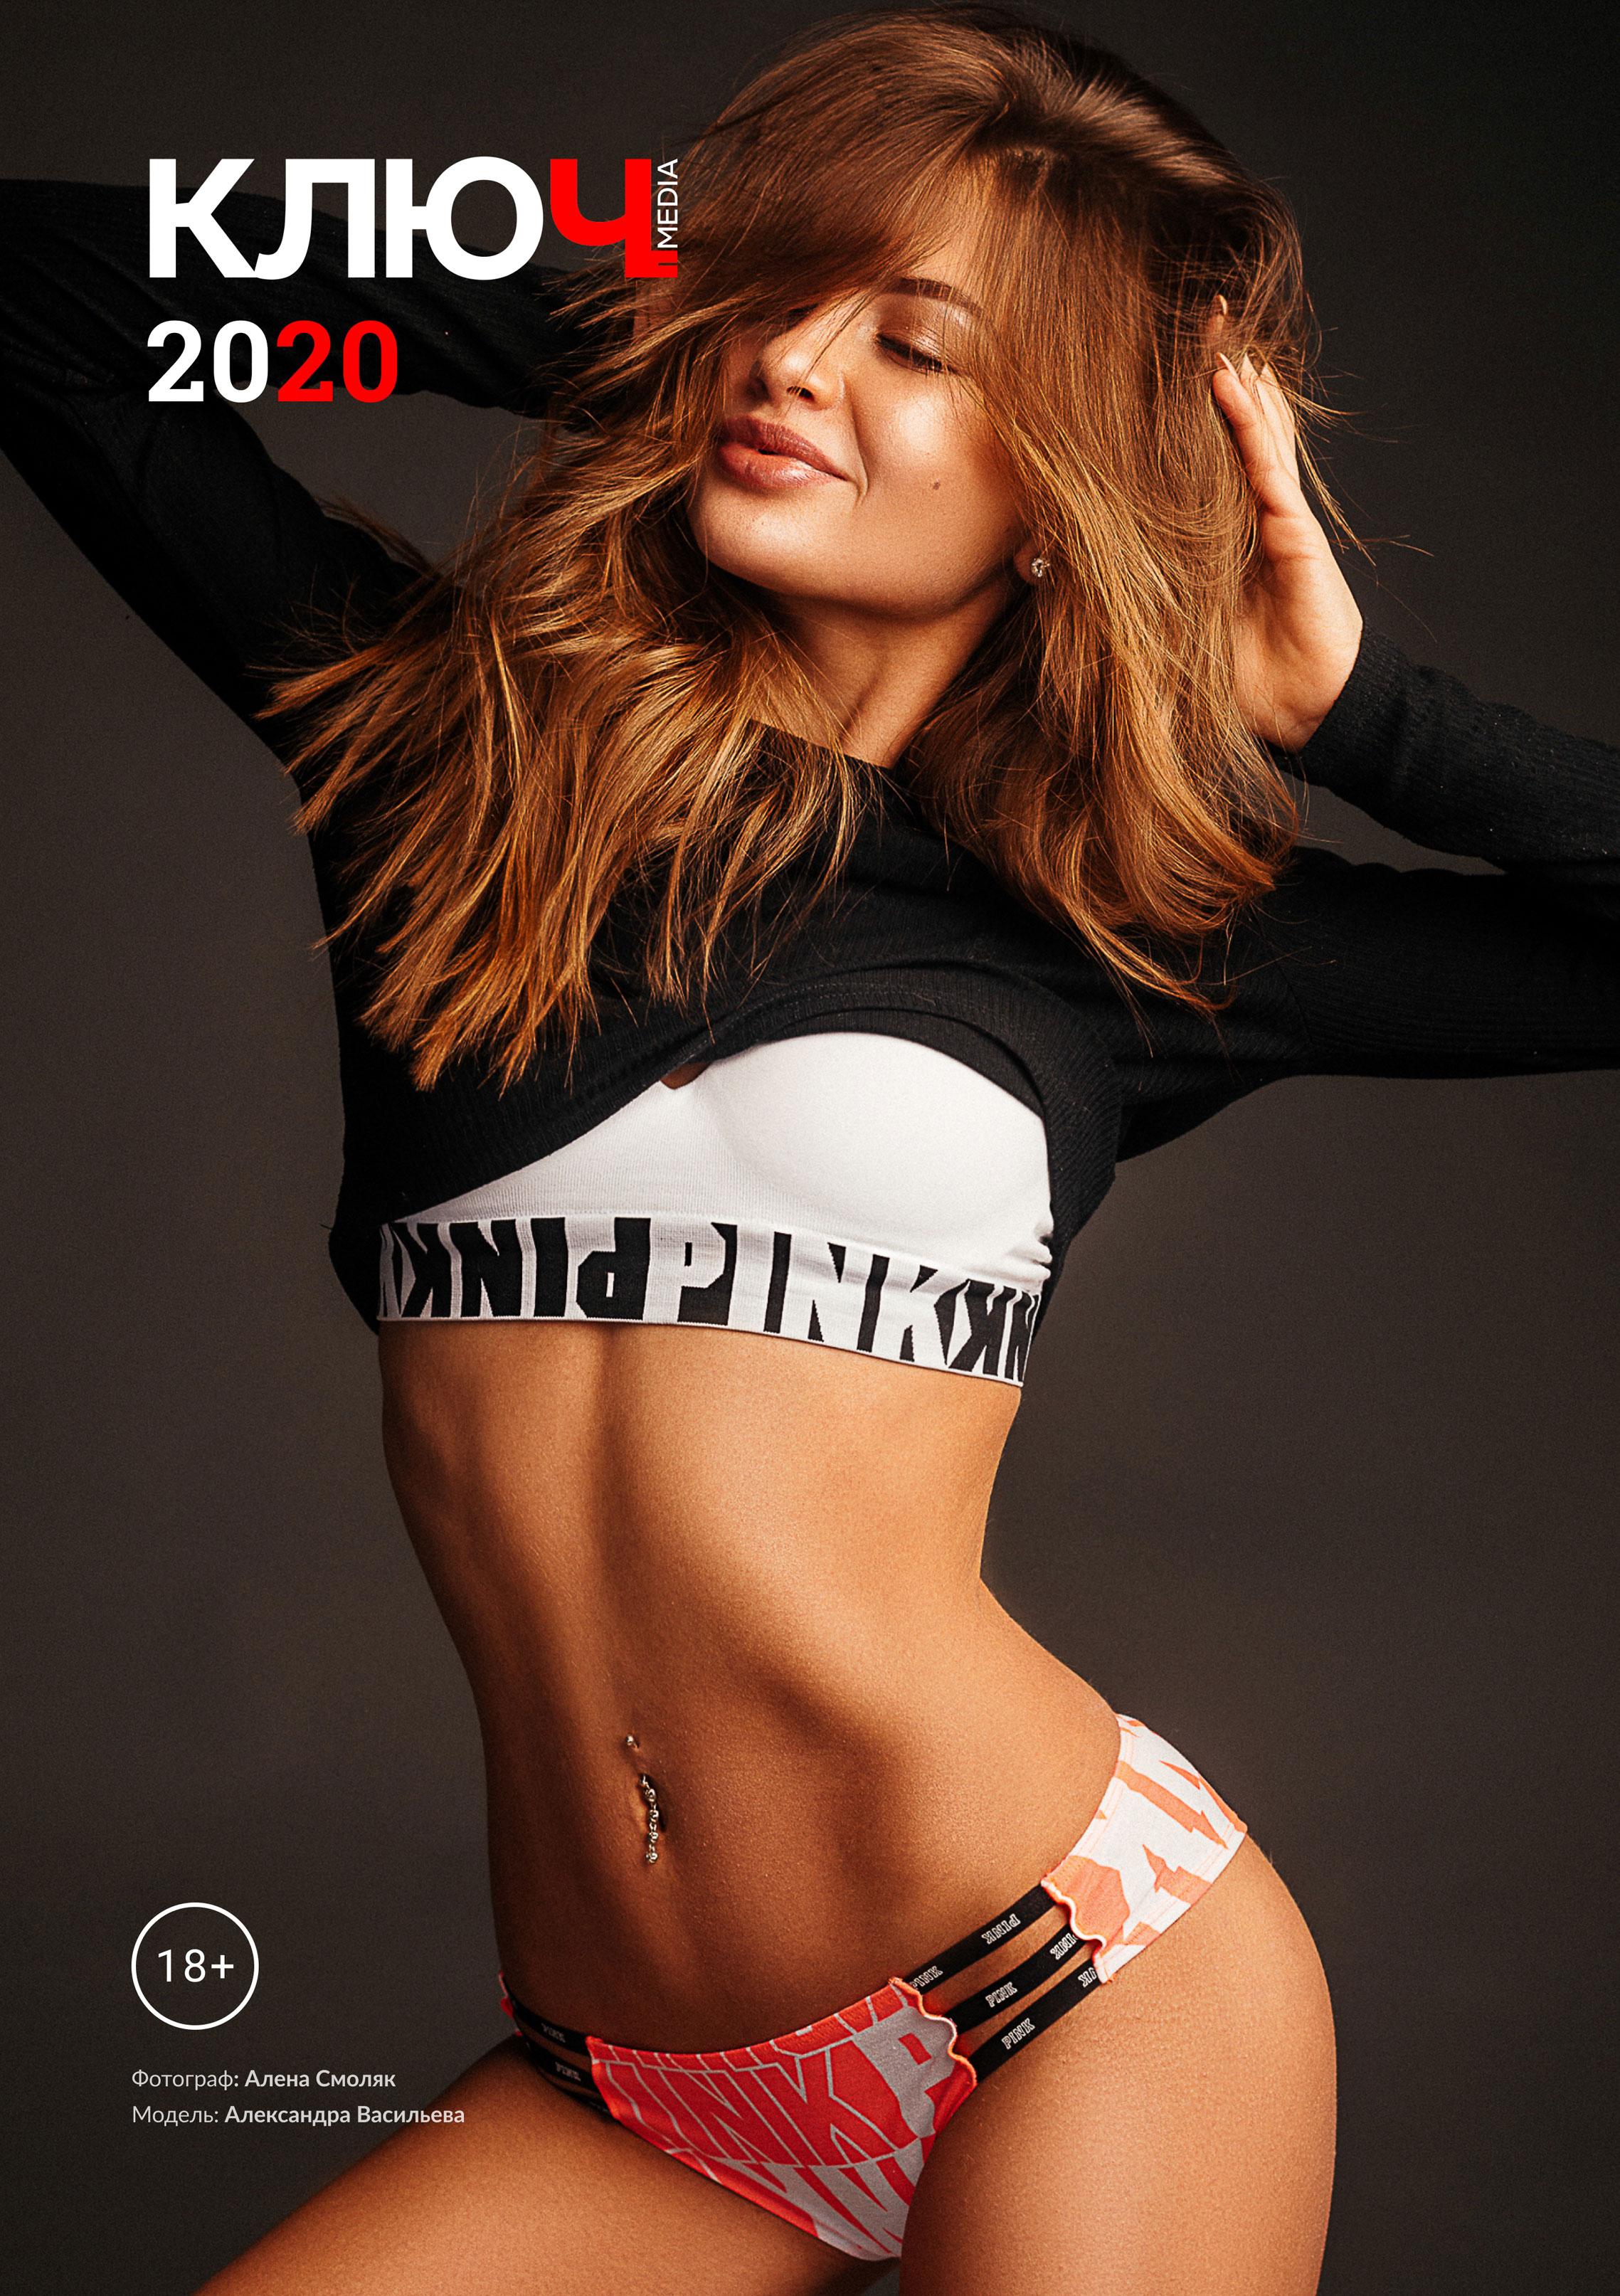 Календарь интернет-проекта Ключ-Медиа на 2020 год / обложка - Александра Васильева